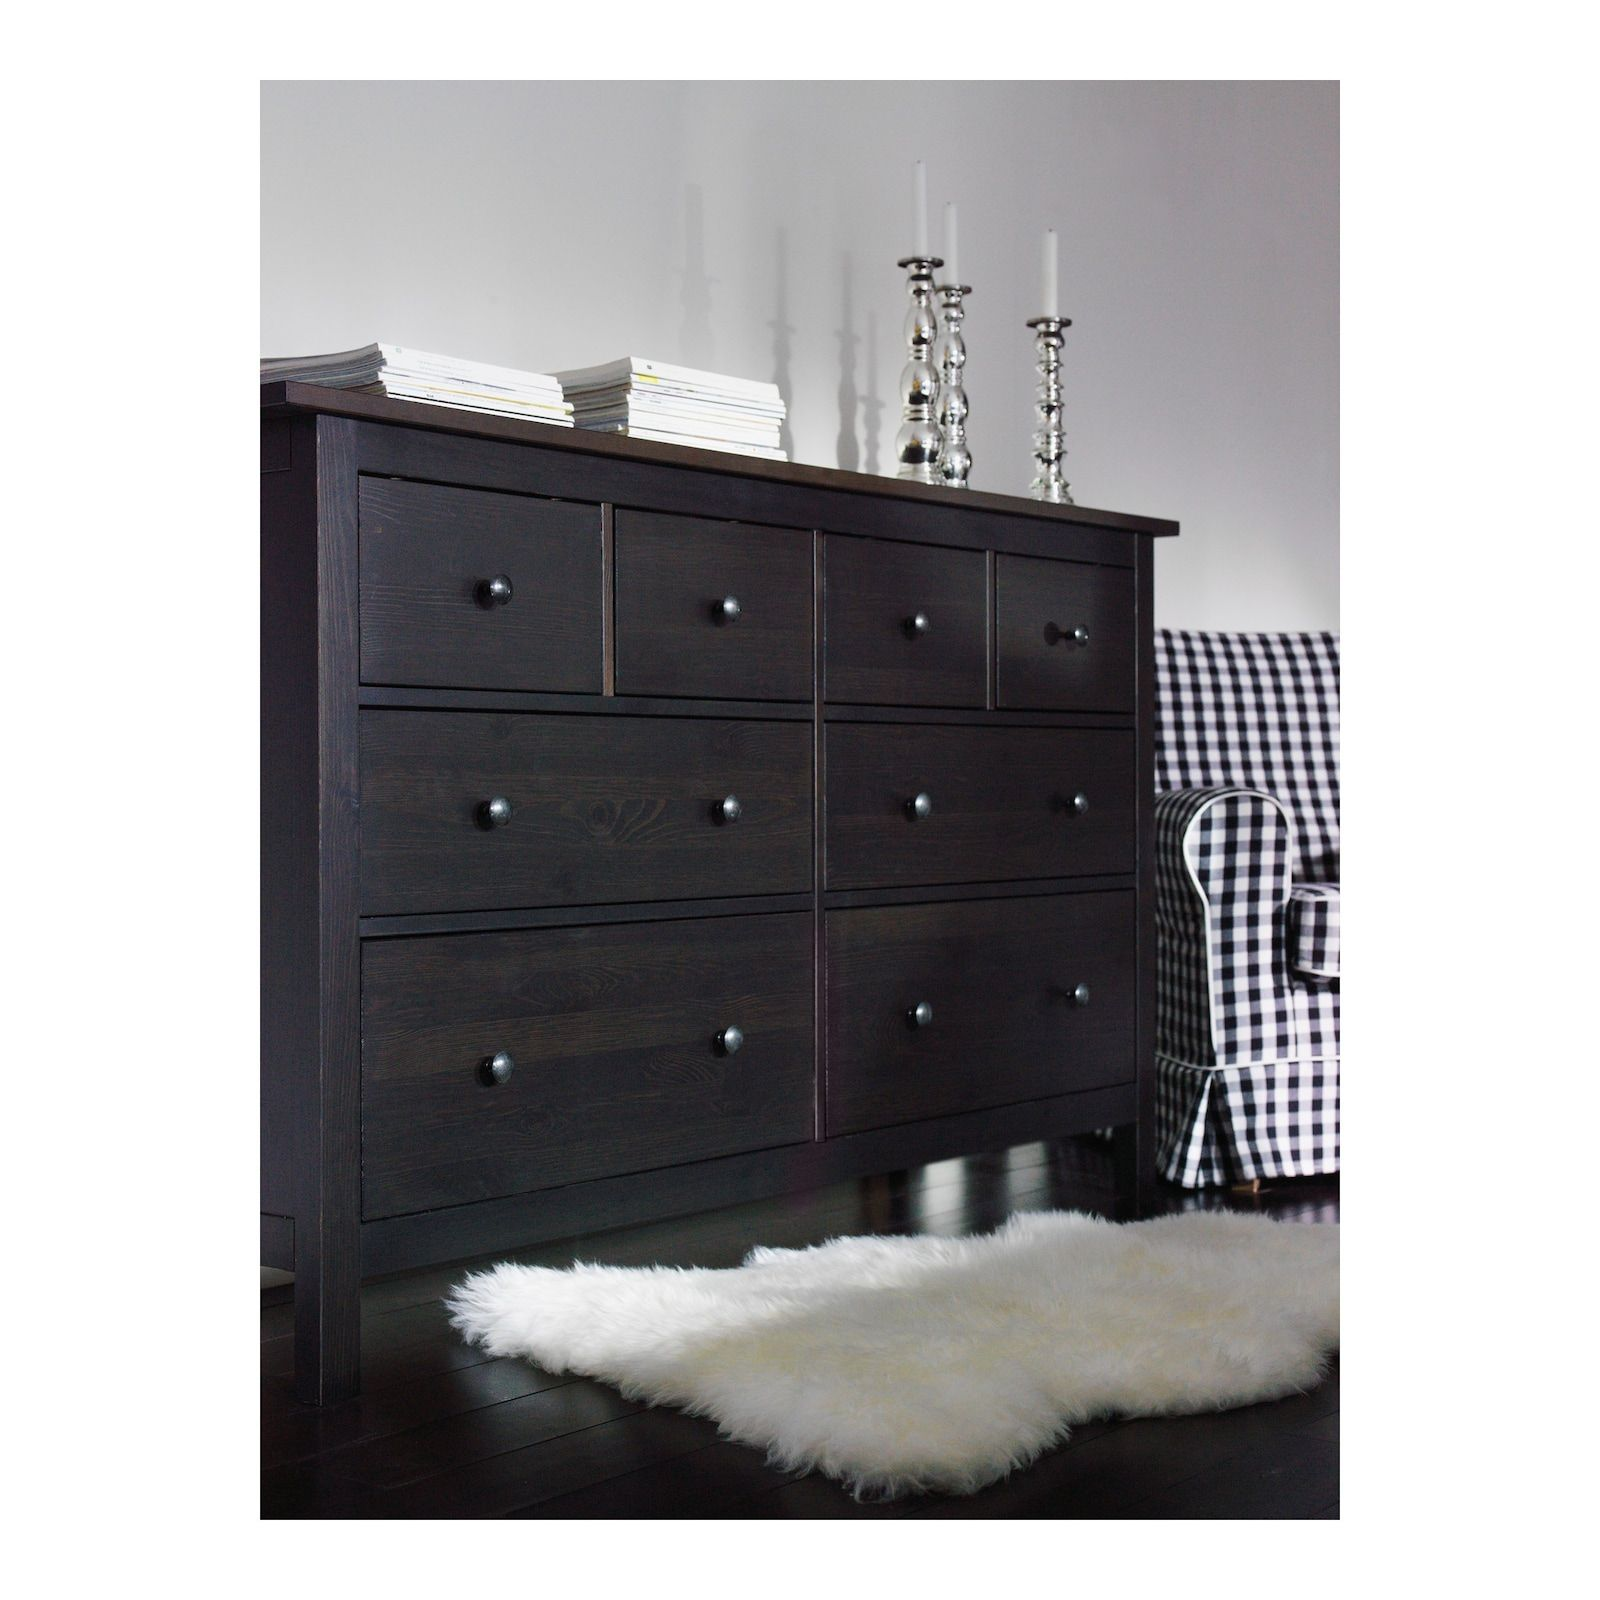 Hemnes 8 Drawer Dresser Black Brown 63x37 3 8 Ikea Ikea Hemnes Dresser Hemnes 8 Drawer Dresser [ 1600 x 1600 Pixel ]